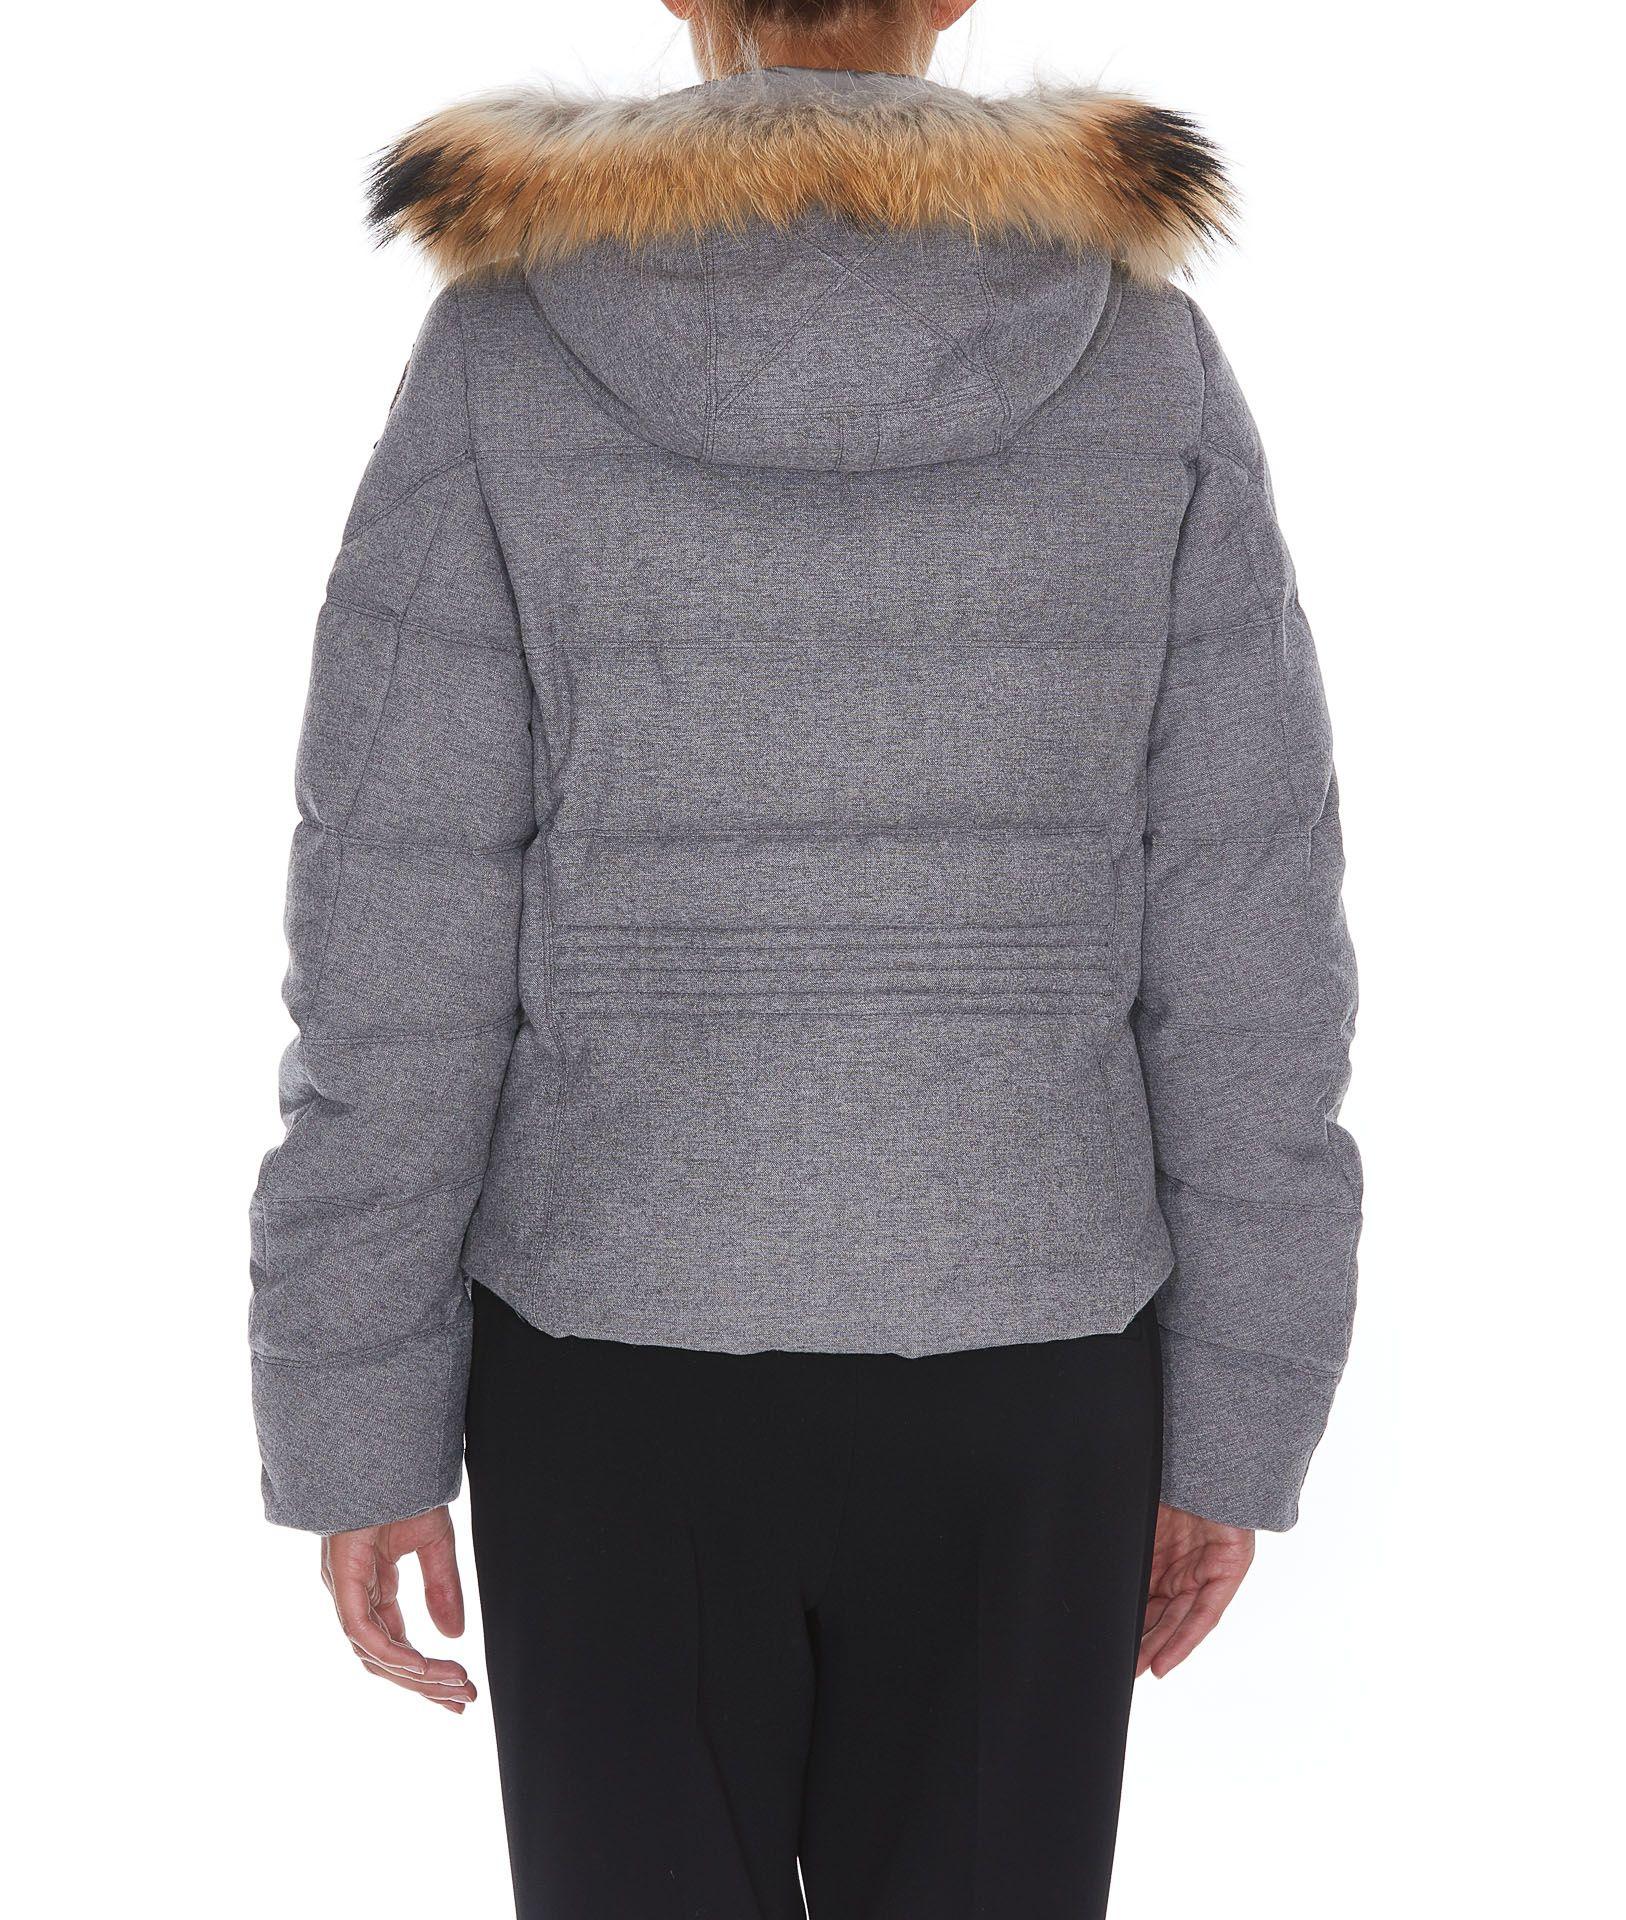 Heavy coats for women